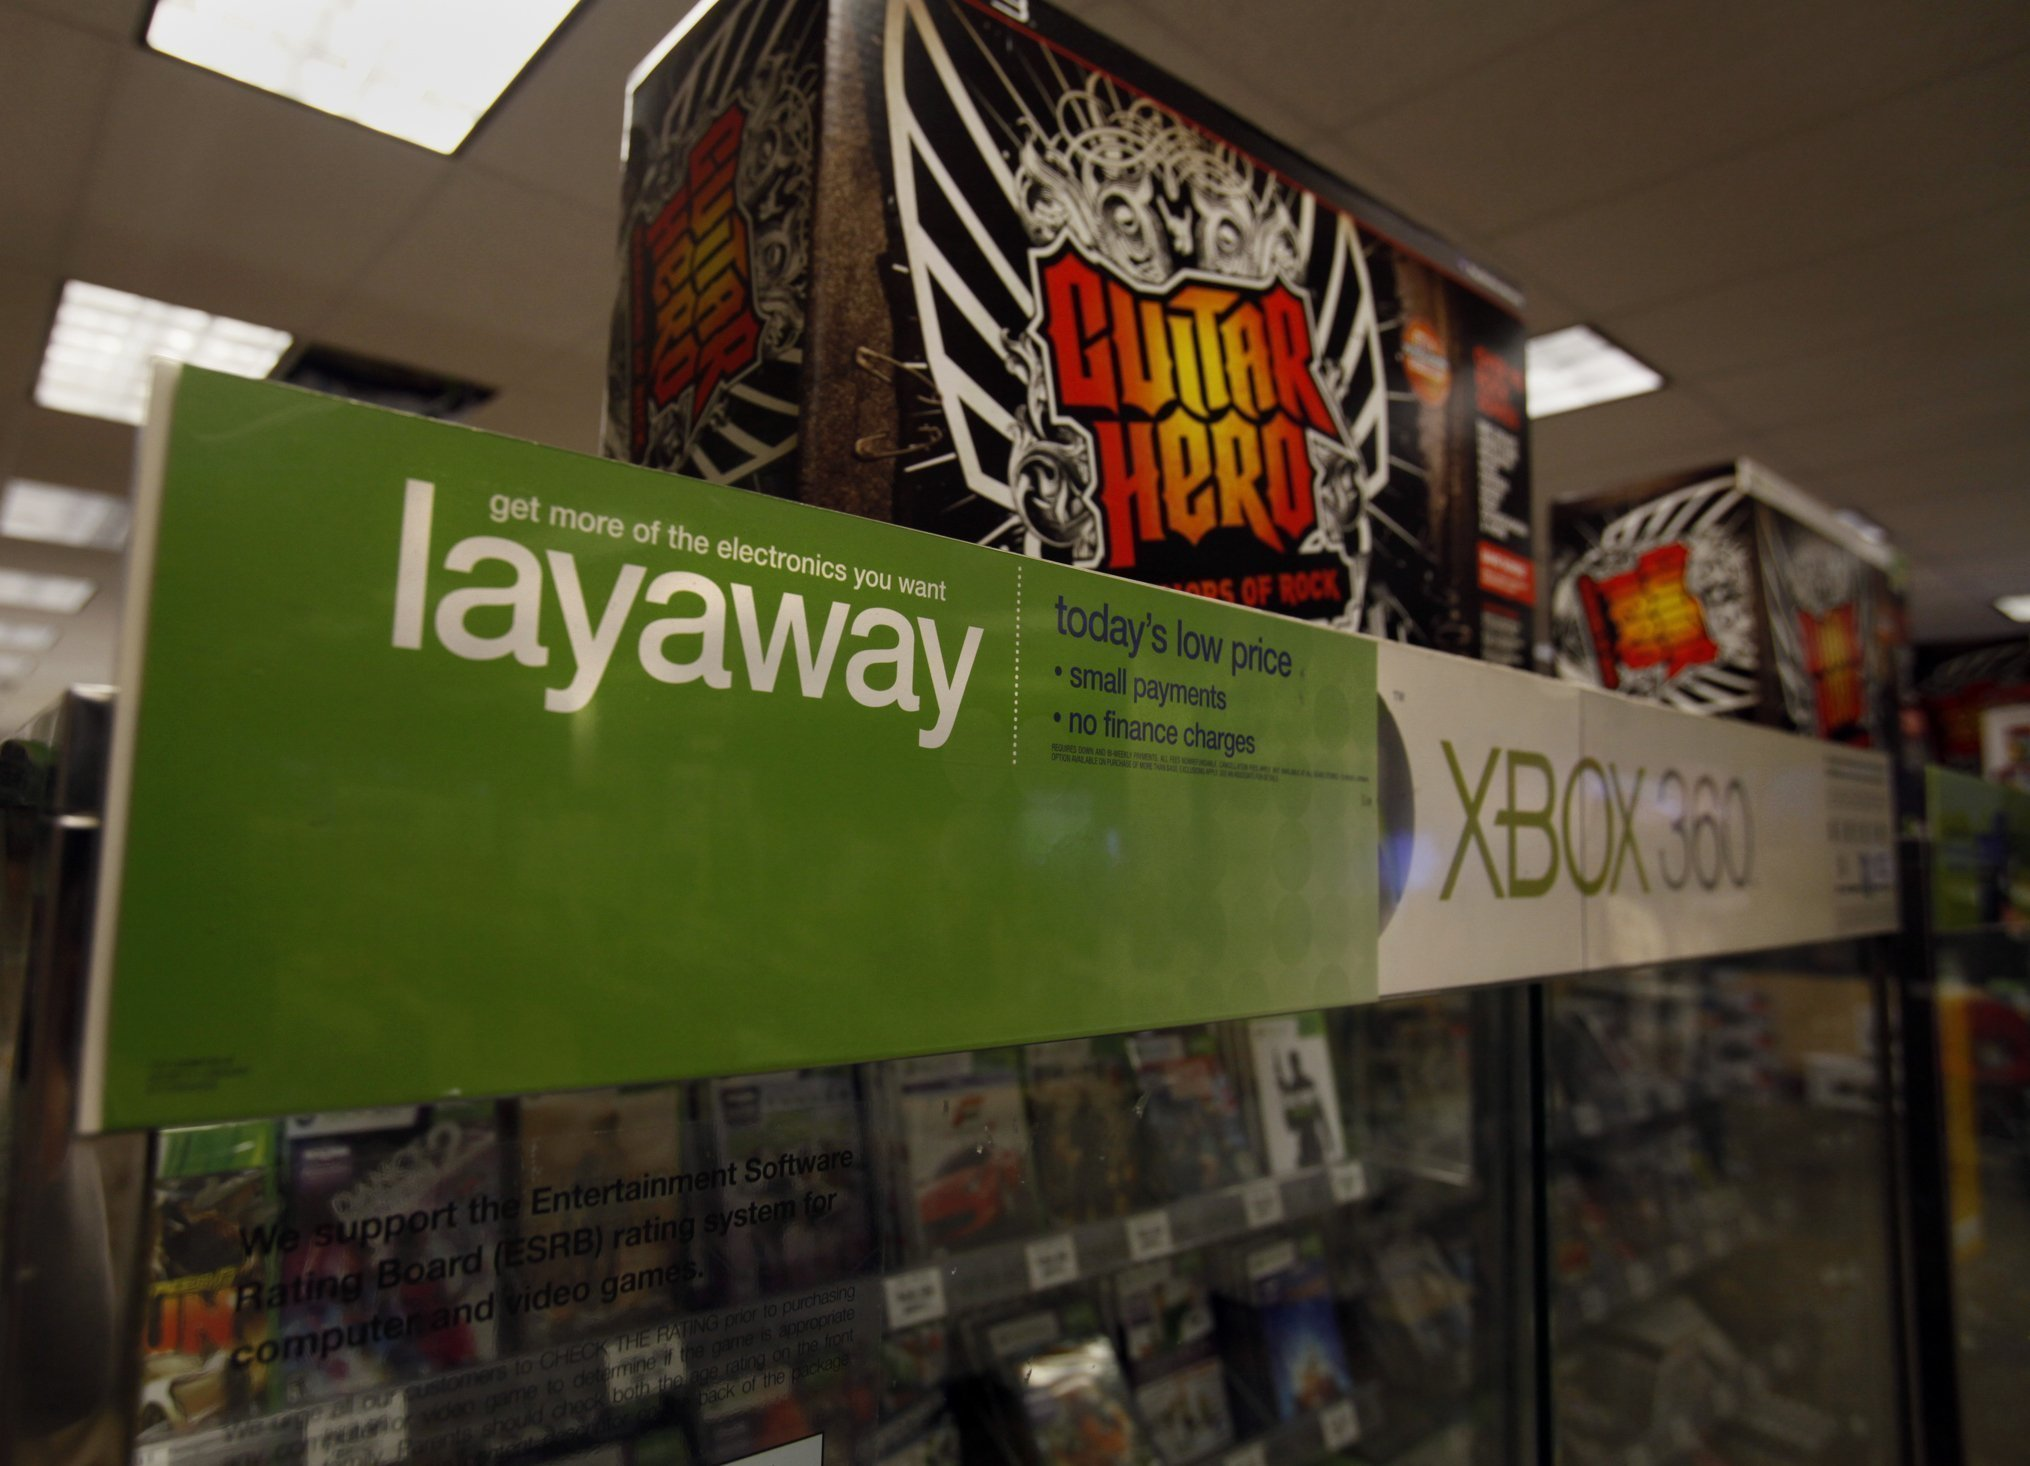 Walmart Toys R Us : Walmart toys r us expand layaway programs the san diego